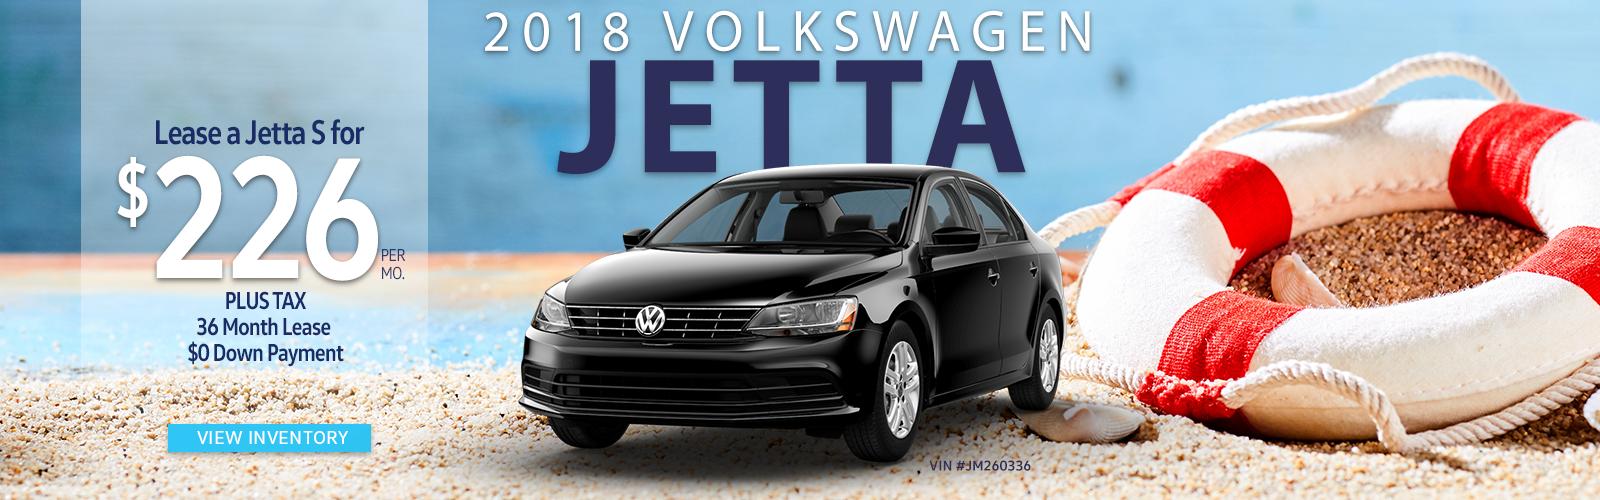 Volkswagen Of Milkwaukee North Car Dealership In Glendale Wi